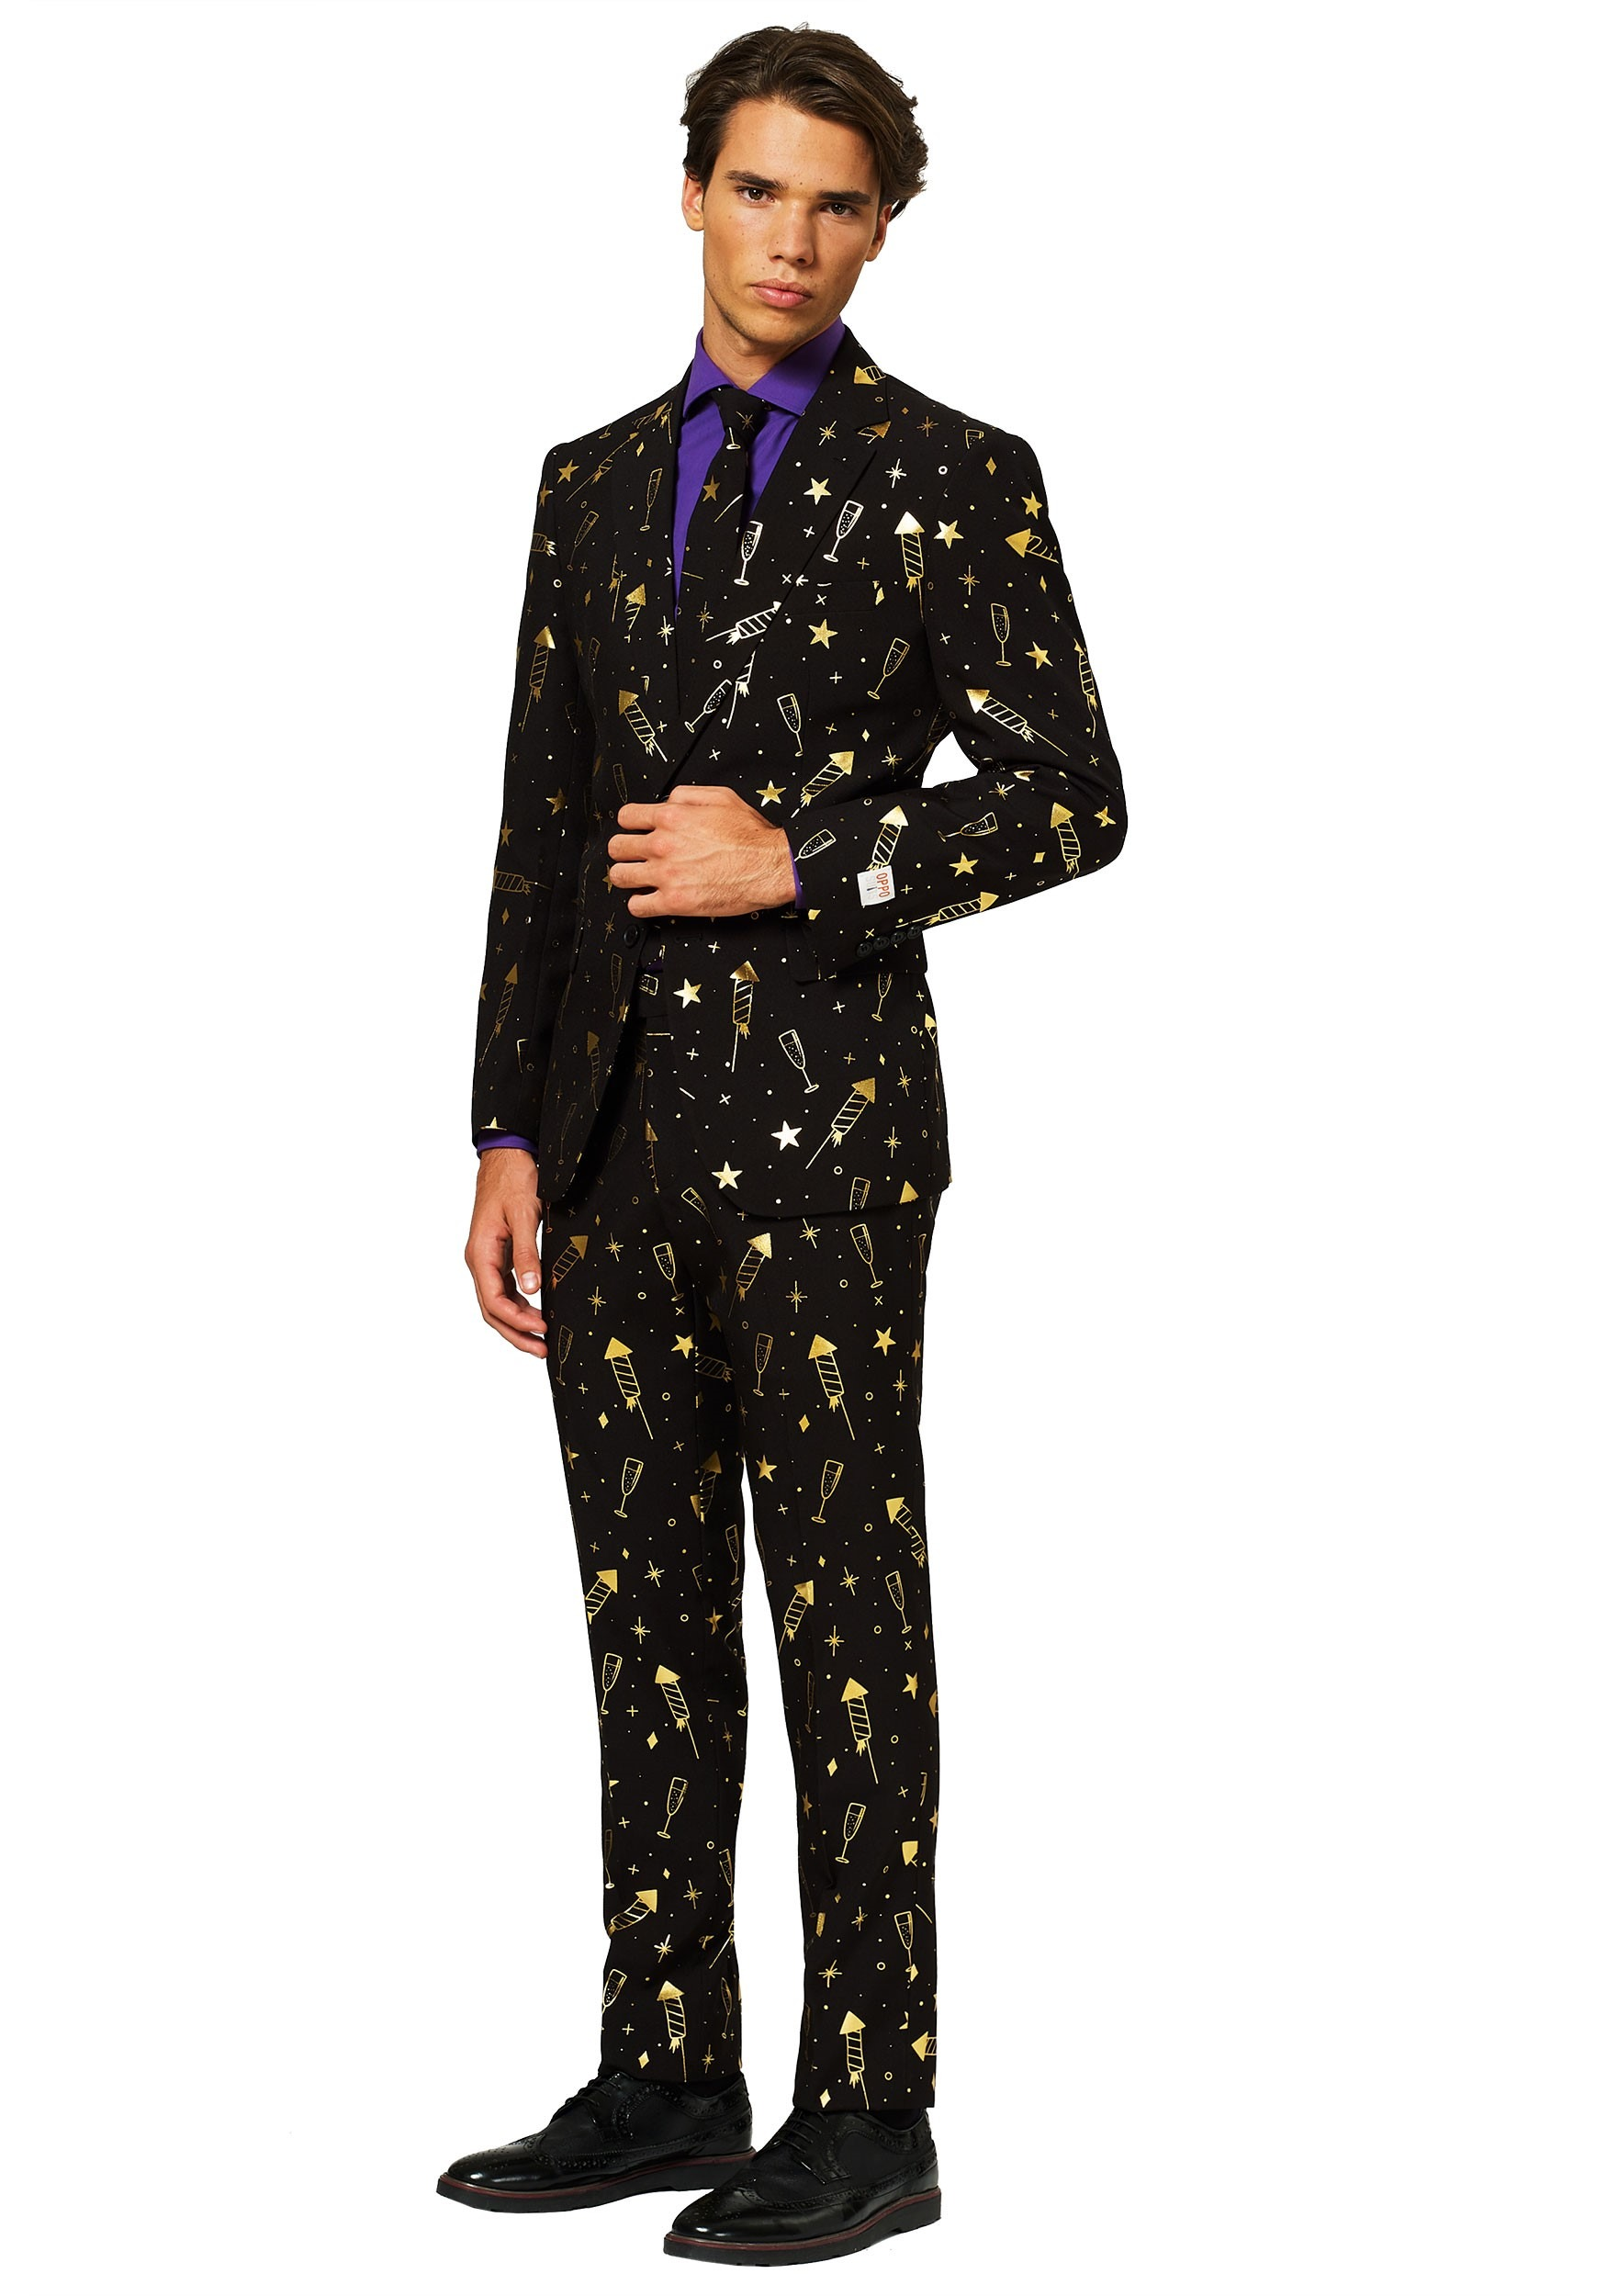 Opposuit Fancy Fireworks Suit Mens